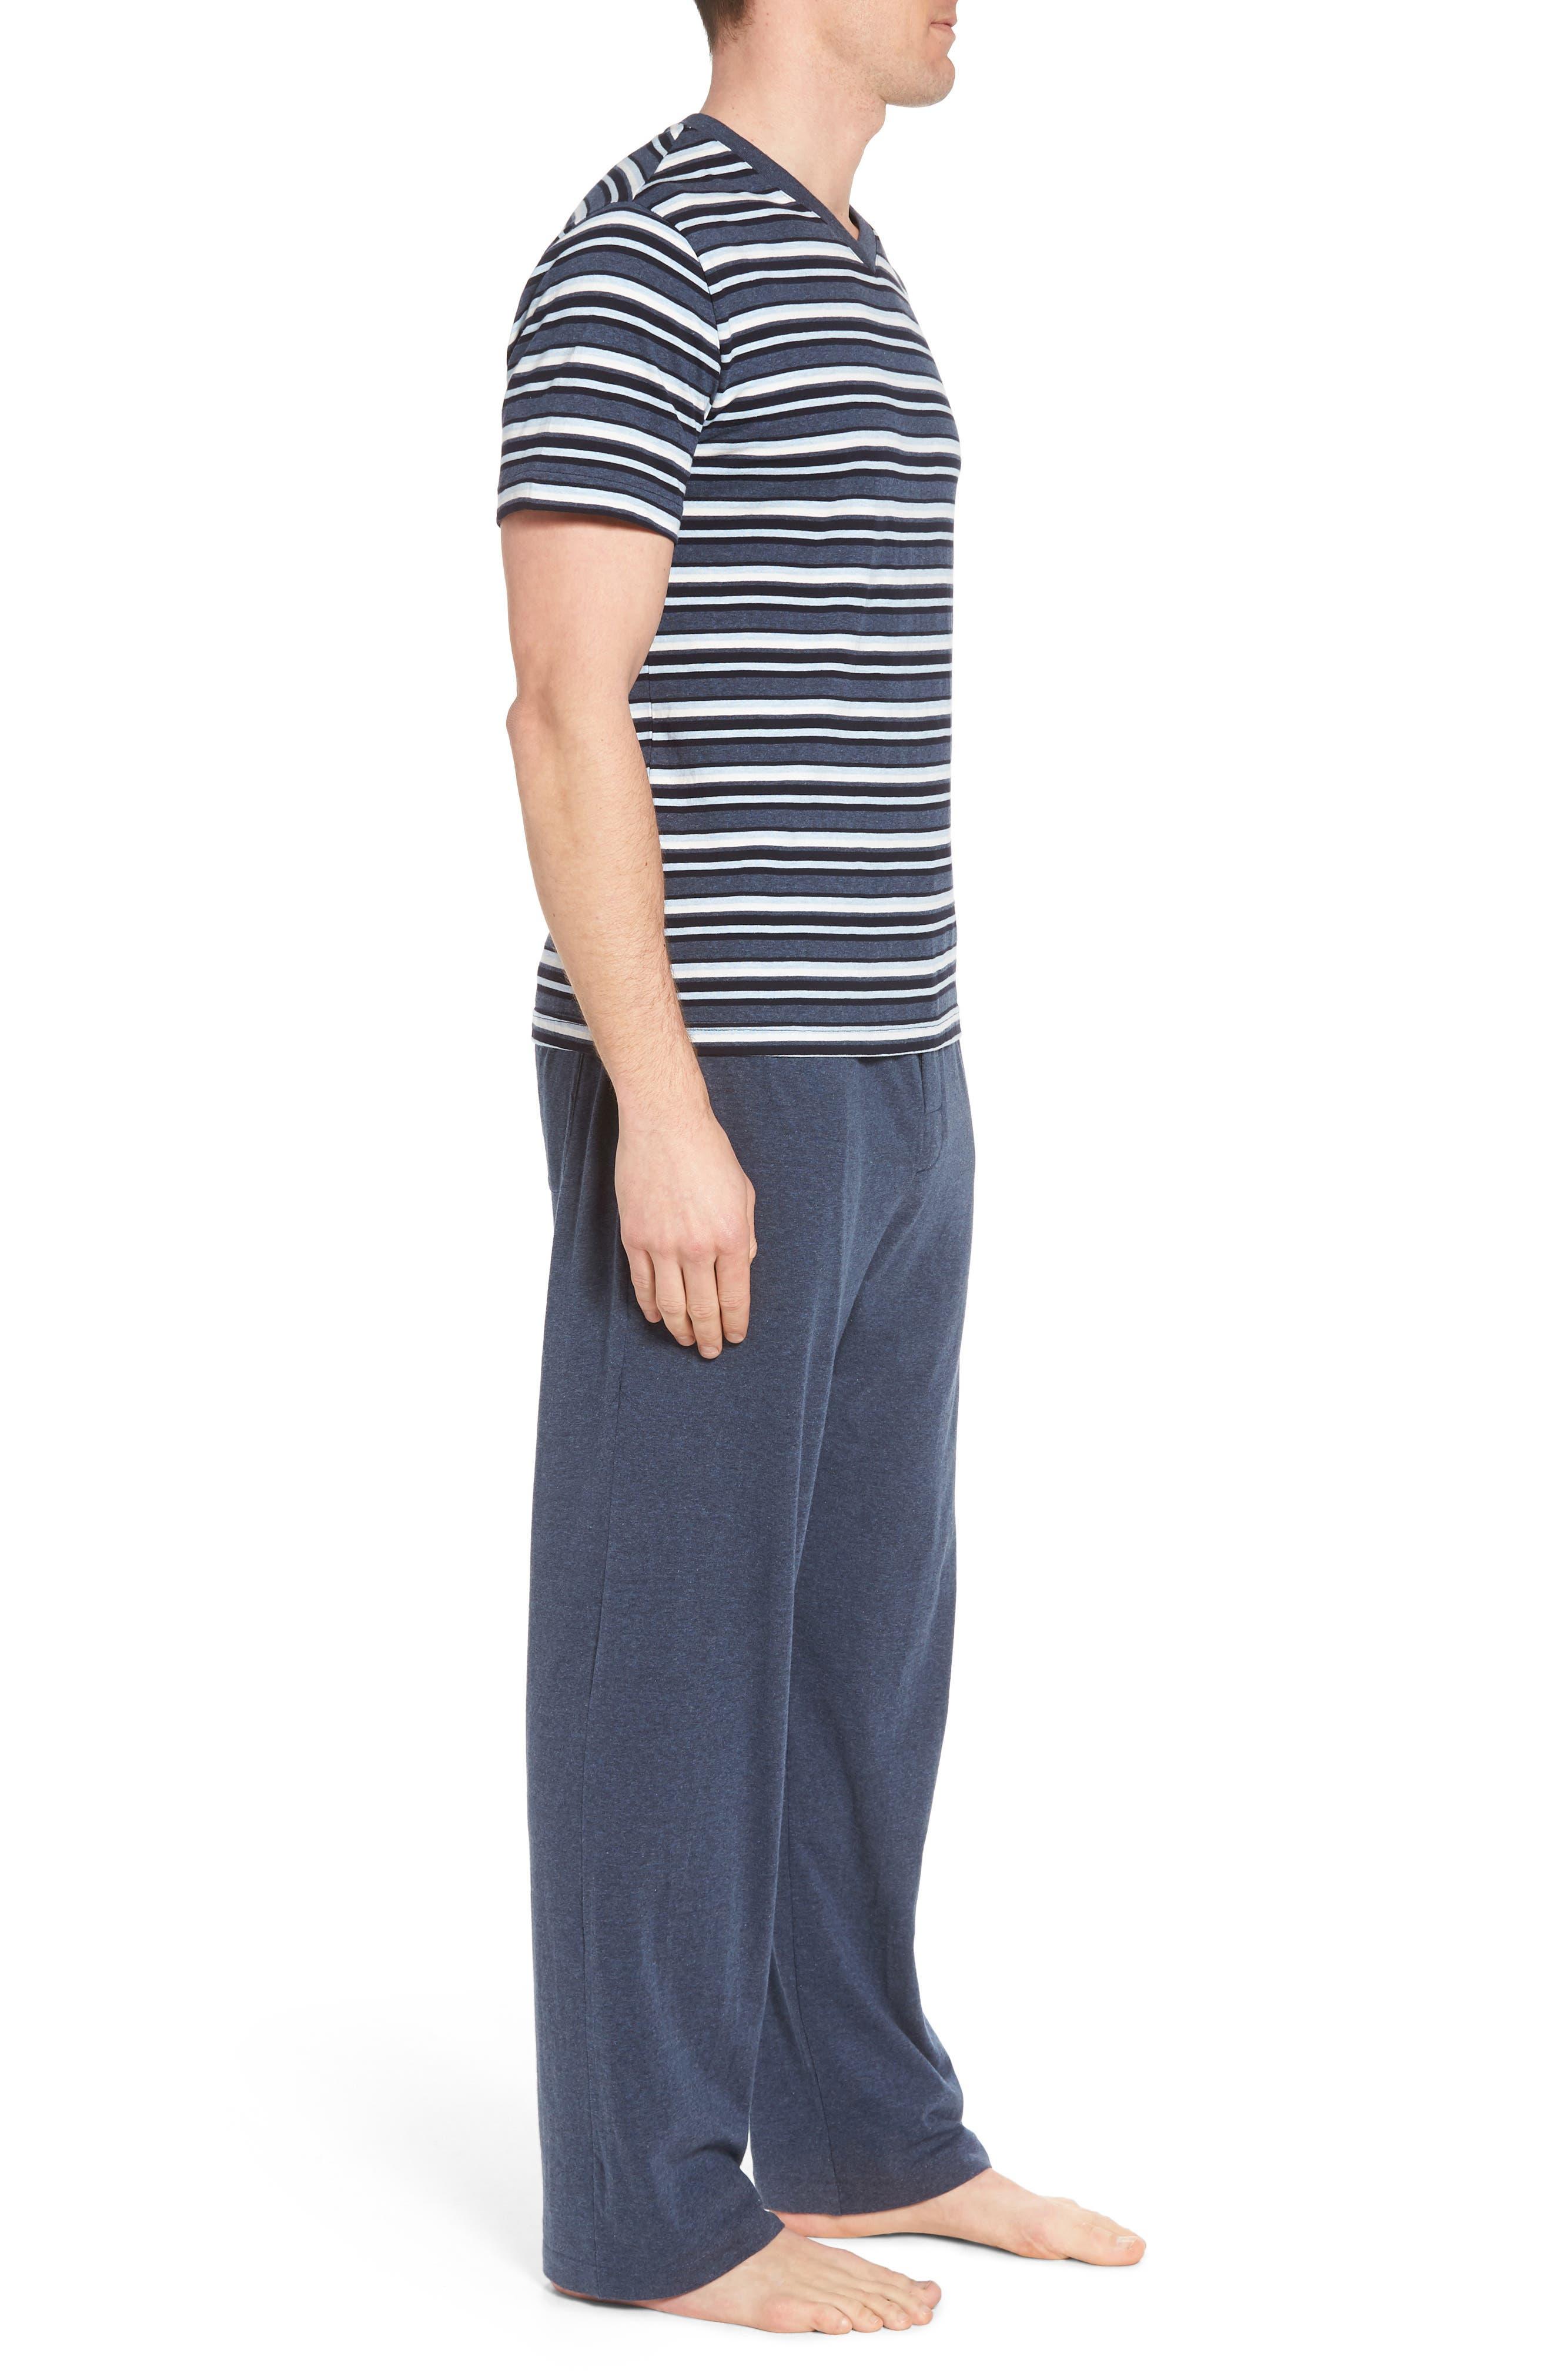 Majetic International Sleep On It Pajama Set,                             Alternate thumbnail 3, color,                             Alfresco Stripe